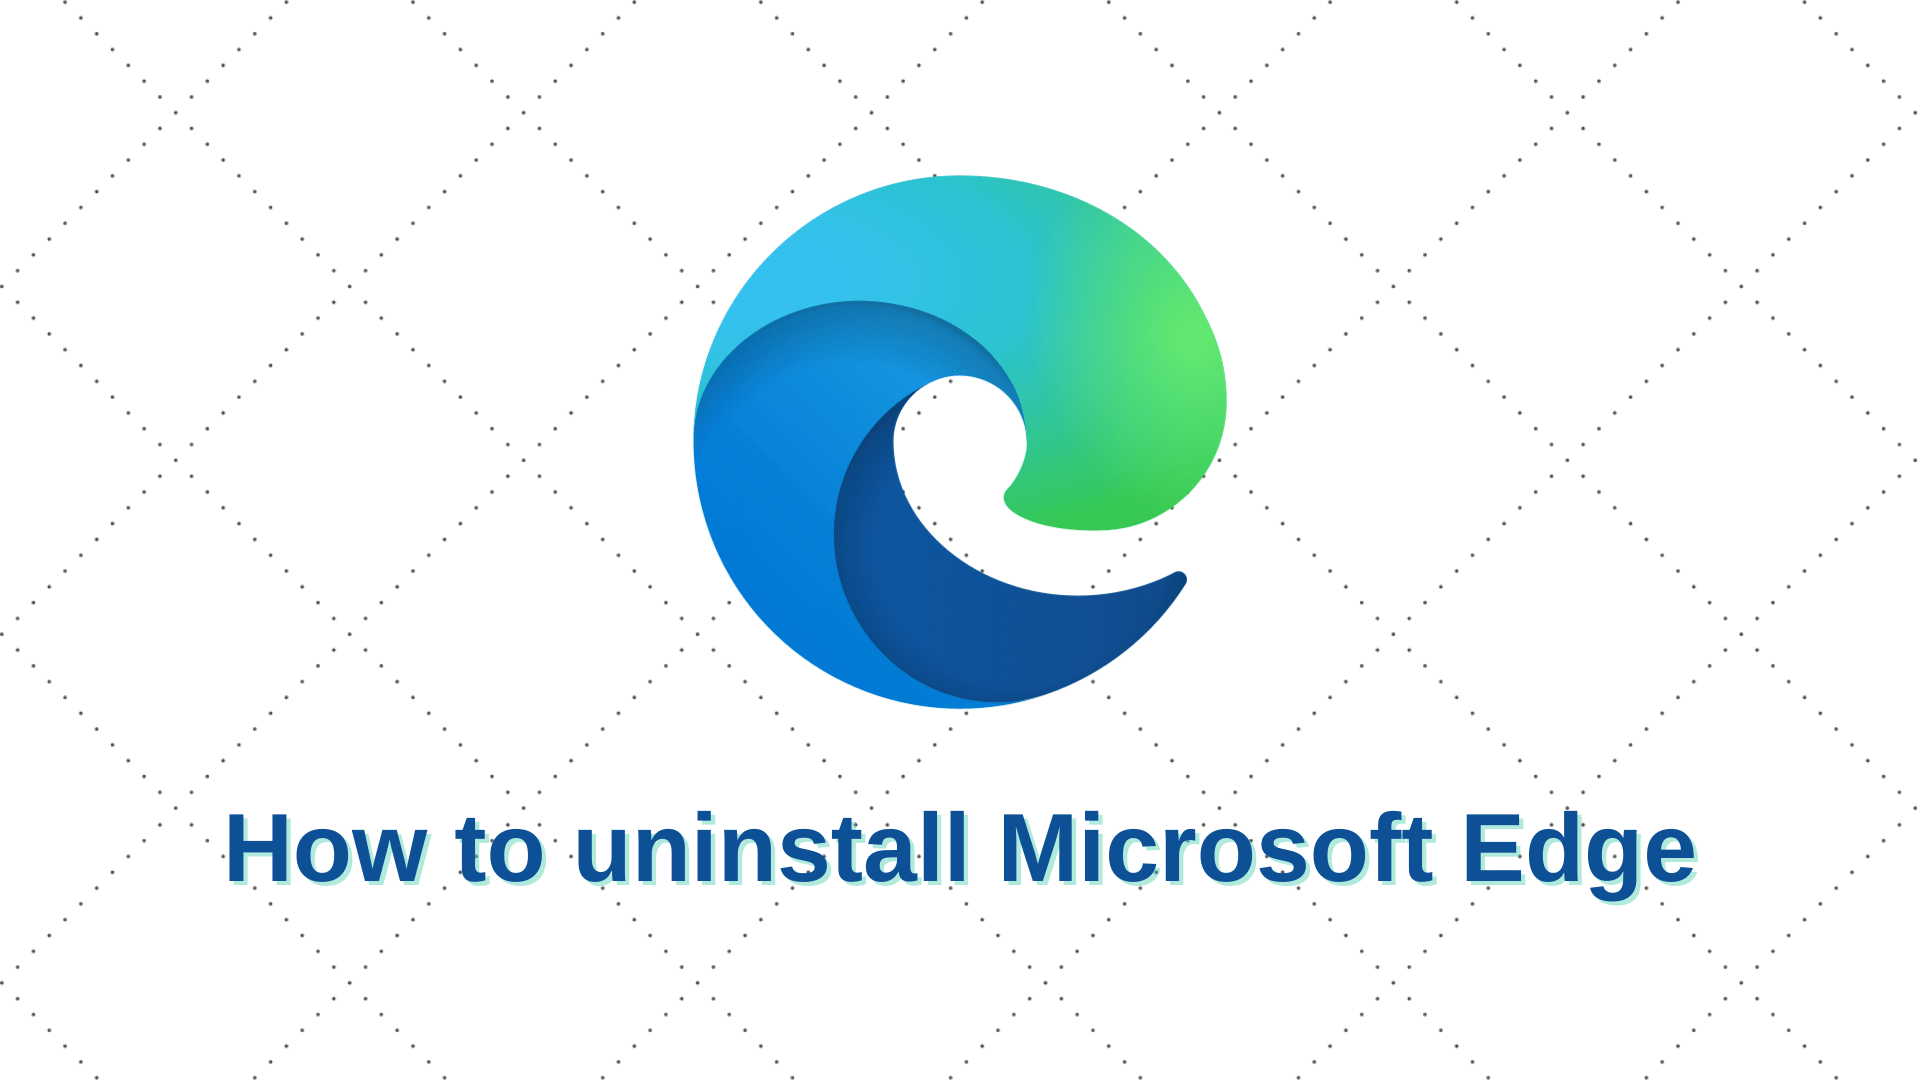 Cómo desinstalar Microsoft Edge